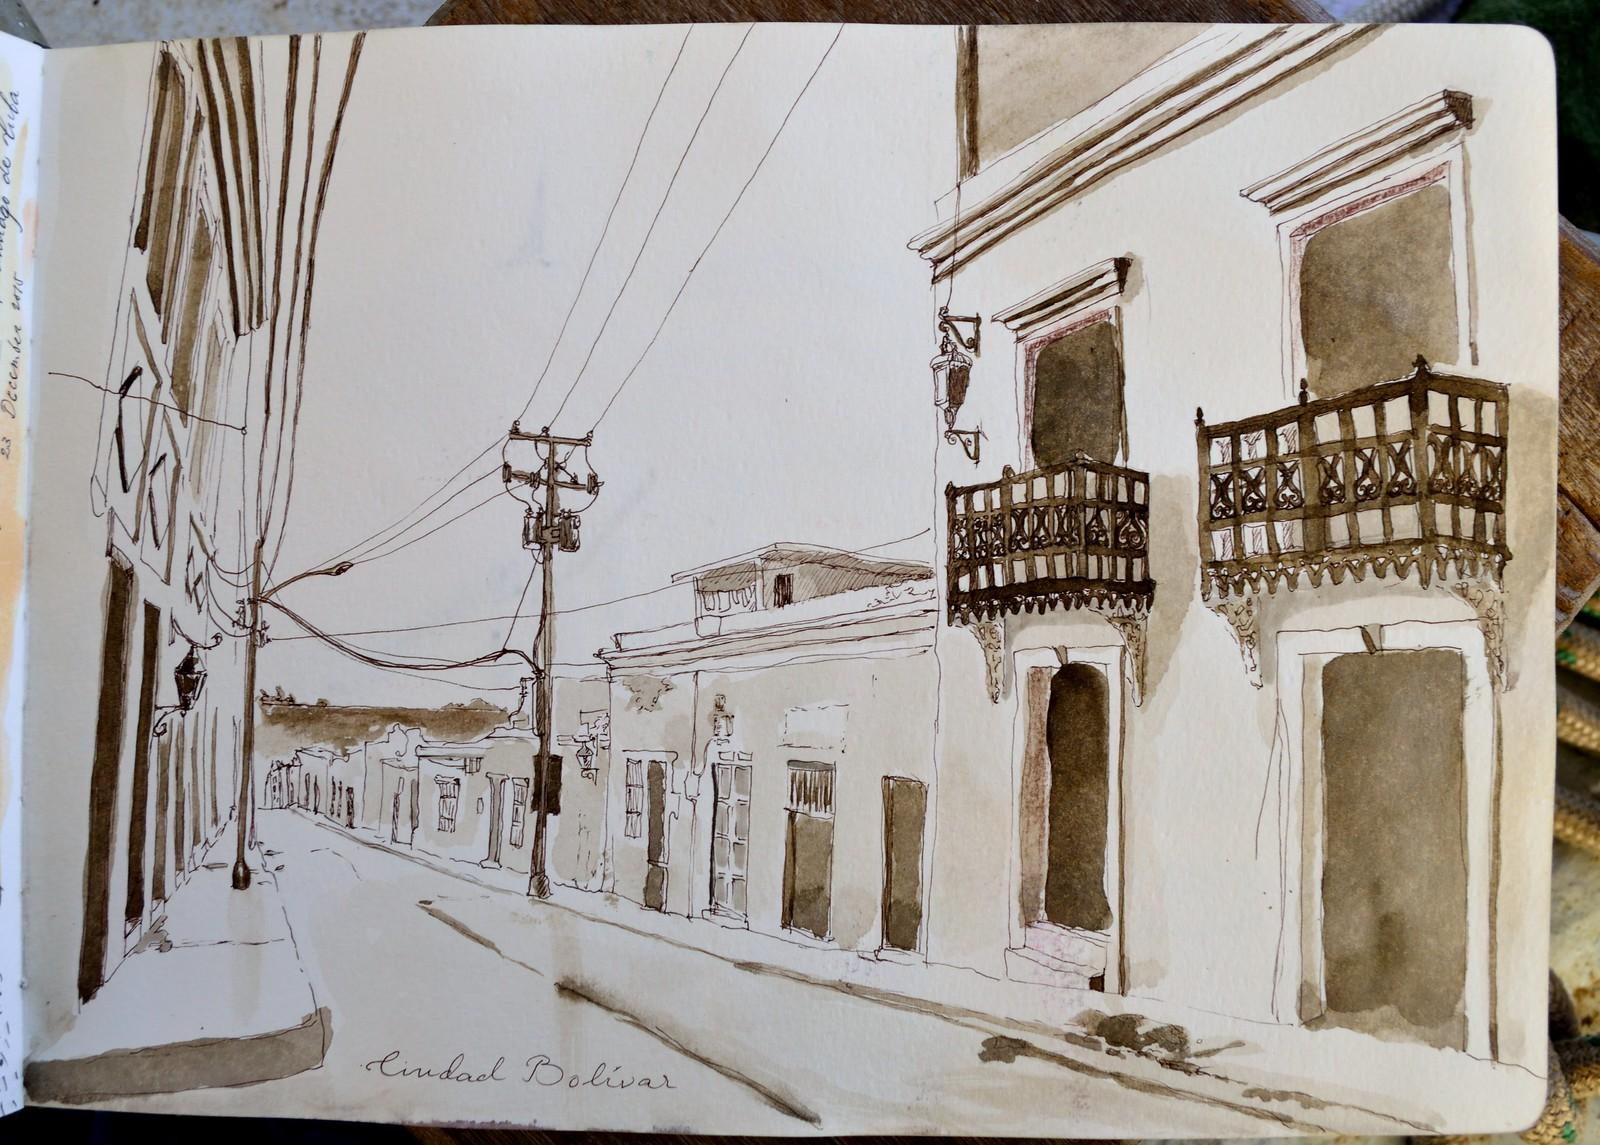 Ciudad Bolivar, Venezuela